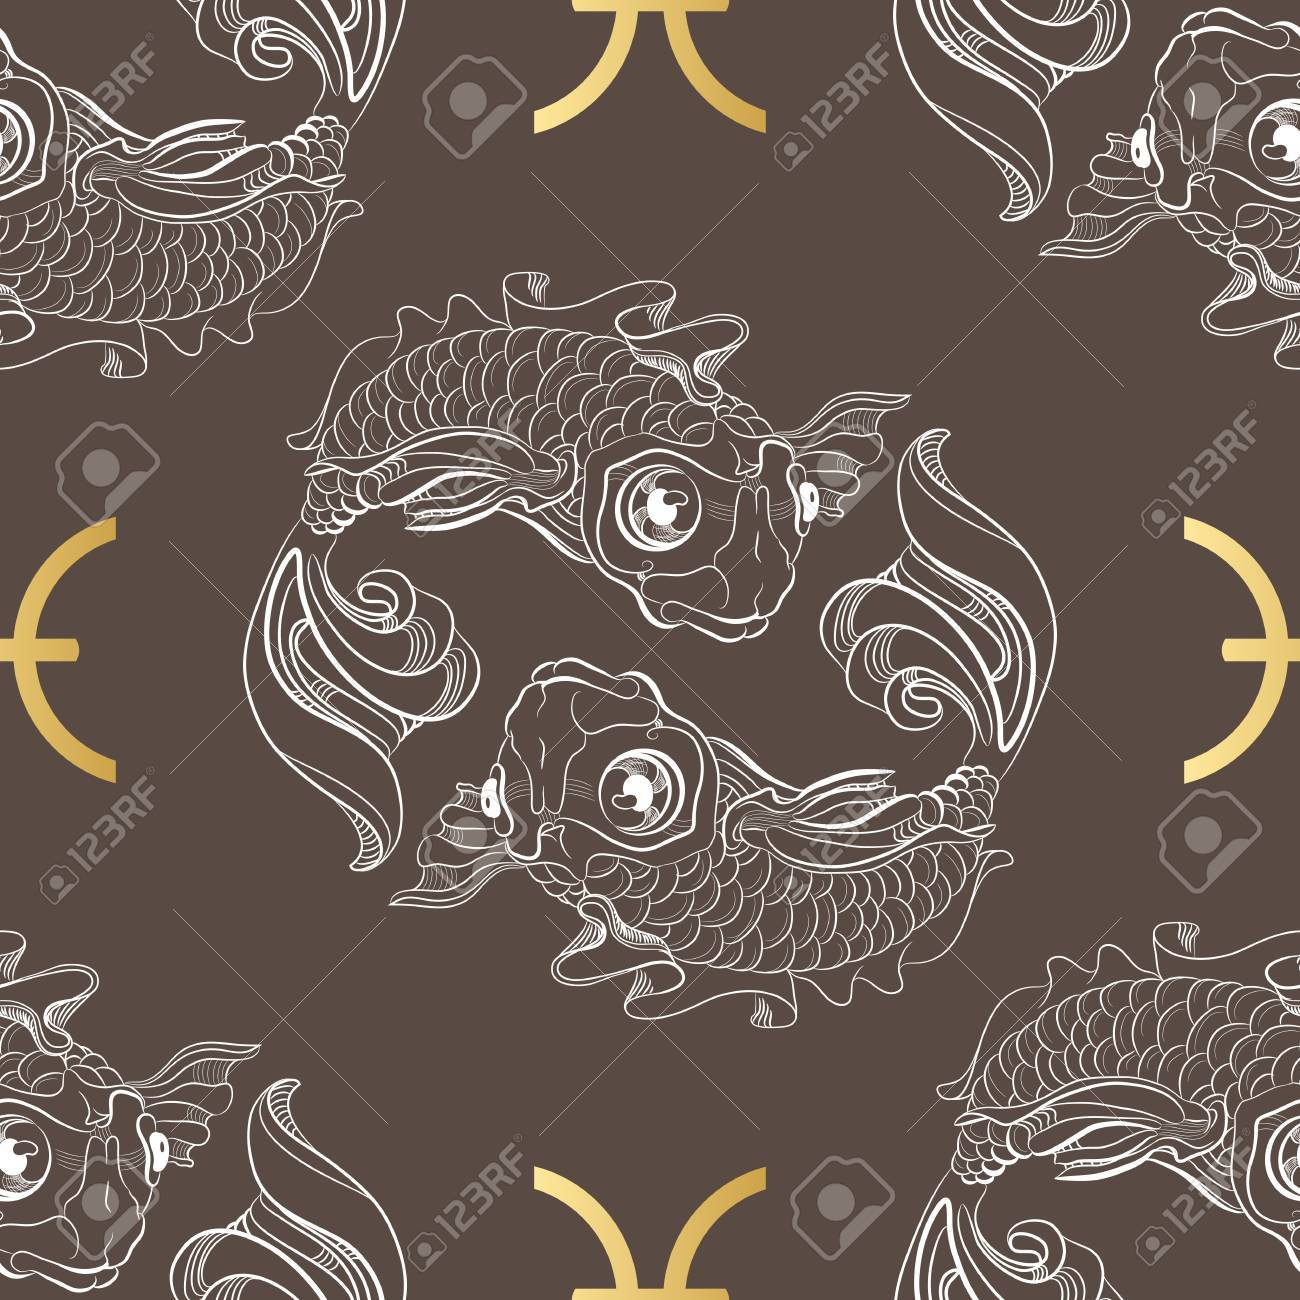 Hand Drawn Line Art Of Decorative Zodiac Sign Pisces Horoscope